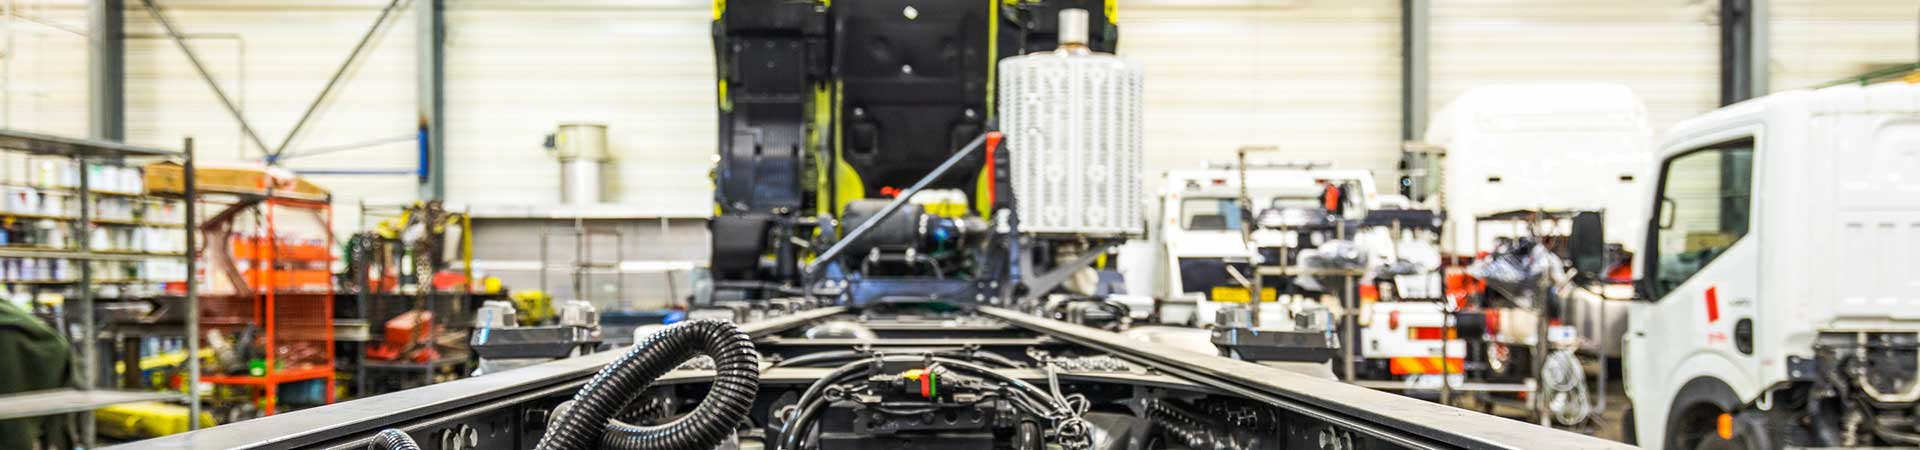 Garage poids lourd autocars utilitaires chessy seine for Garage auto meaux